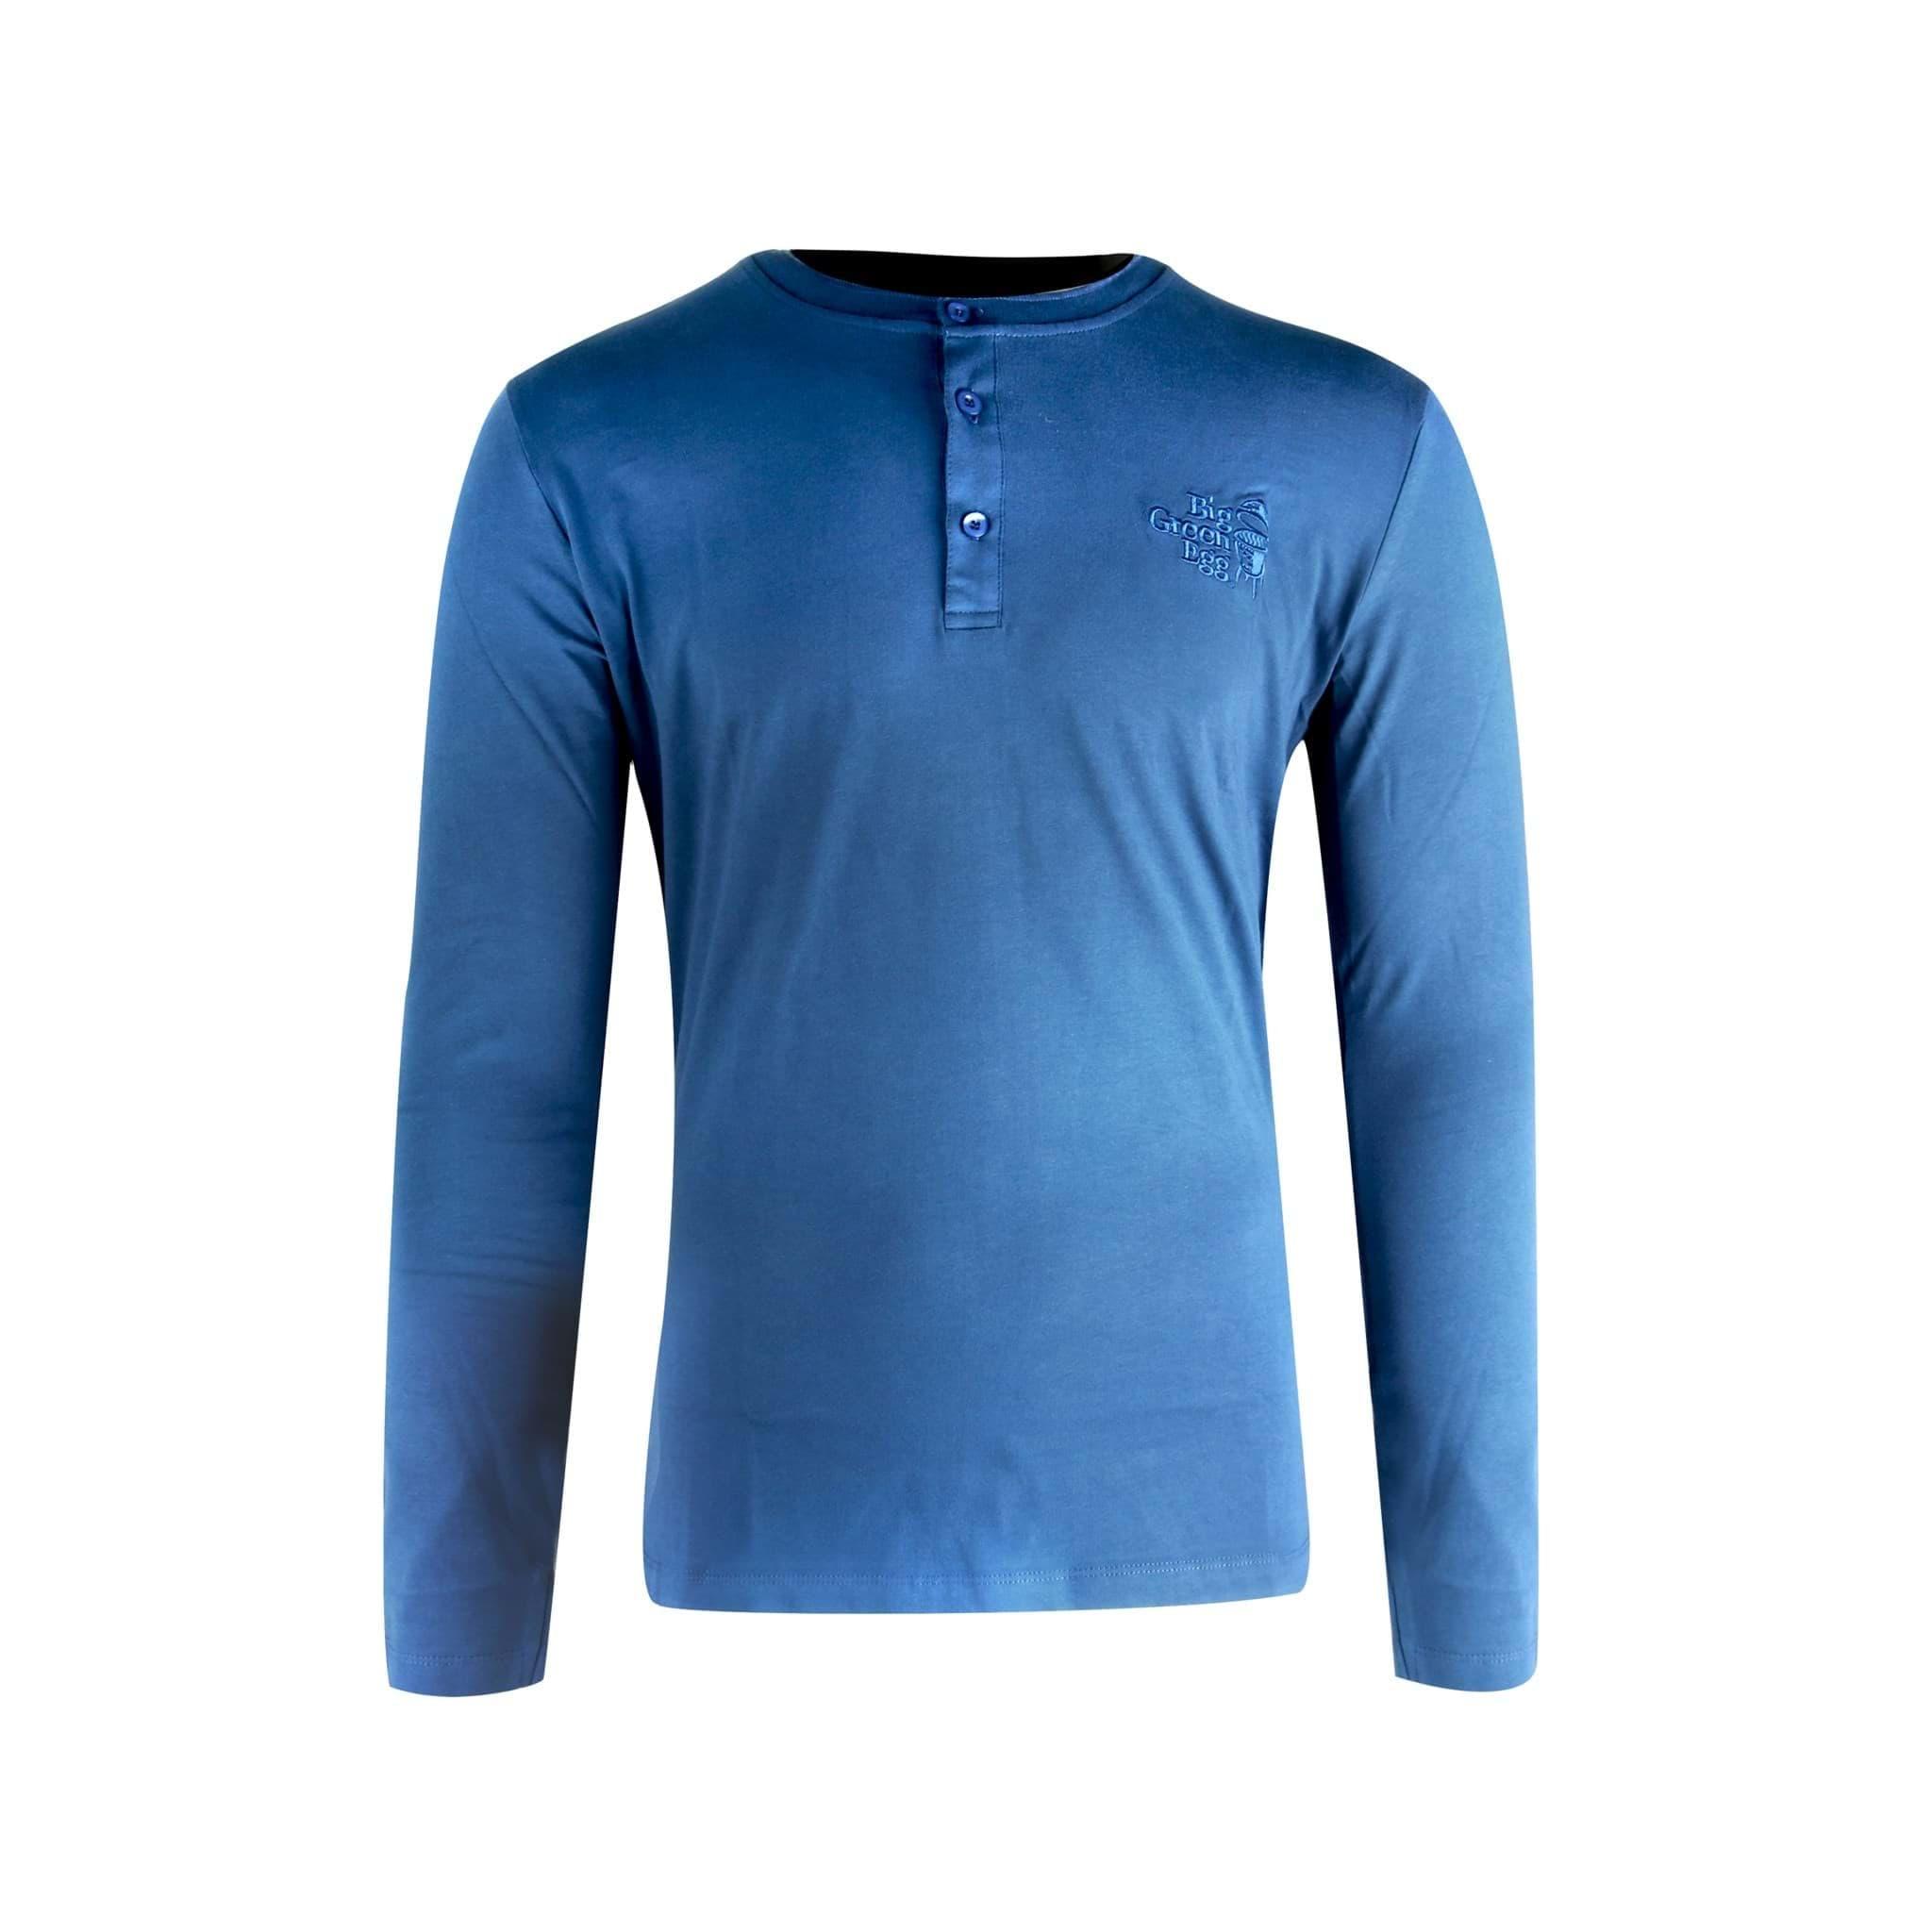 LONG SHIRT - BLUE | Badé - Outdoor Living on Bade Outdoor Living id=92033